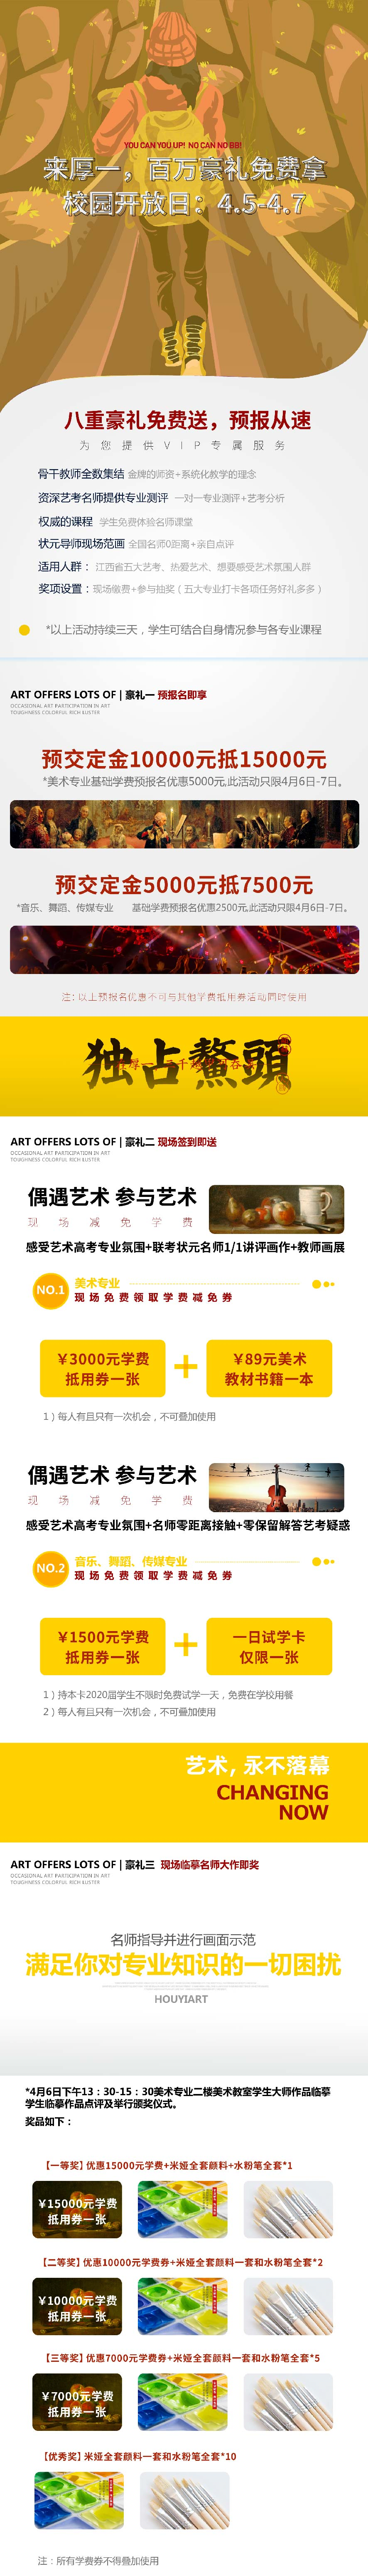 2019藝術節-長圖-01.jpg